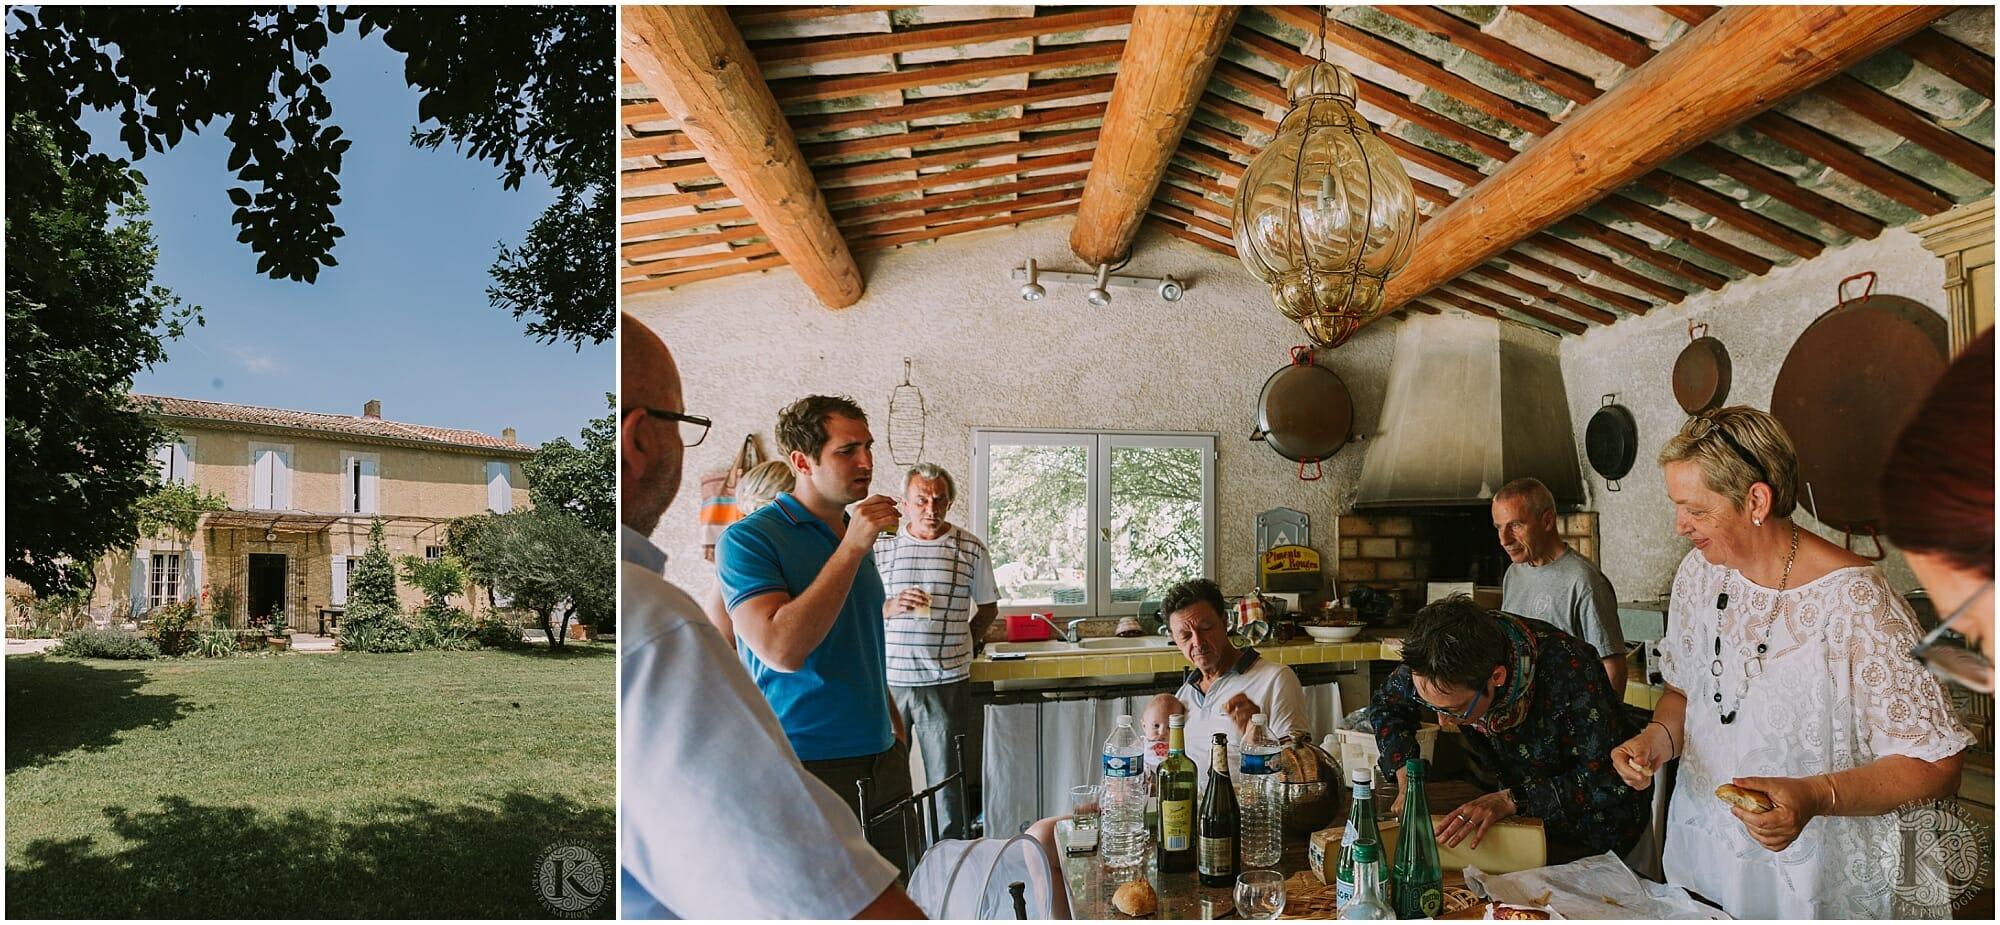 Kateryna-photos-photographe-mariage-chateau-des-3-fontaines-provence-avignon-vaucluse-sud_0009.jpg